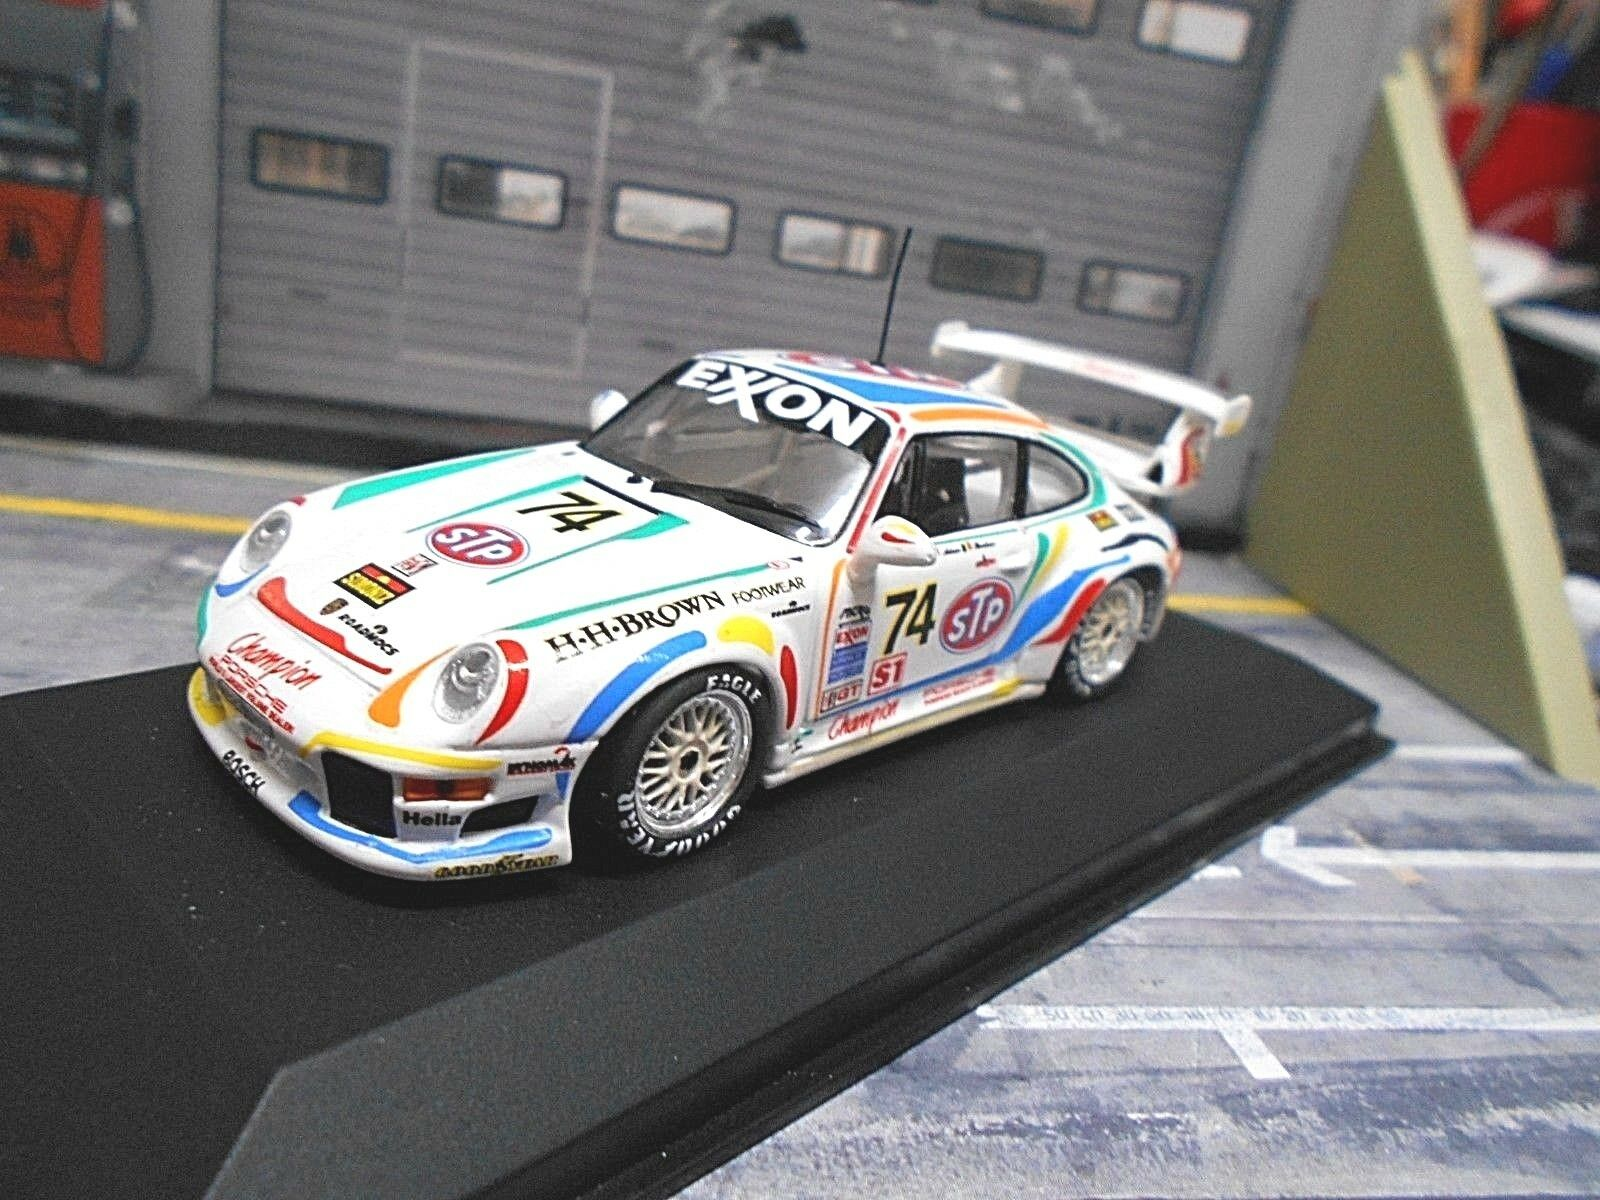 PORSCHE 911 993 gt2 RS 24h DAYTONA 1996 stucco Boutsen  74 STP Minichamps 1 43